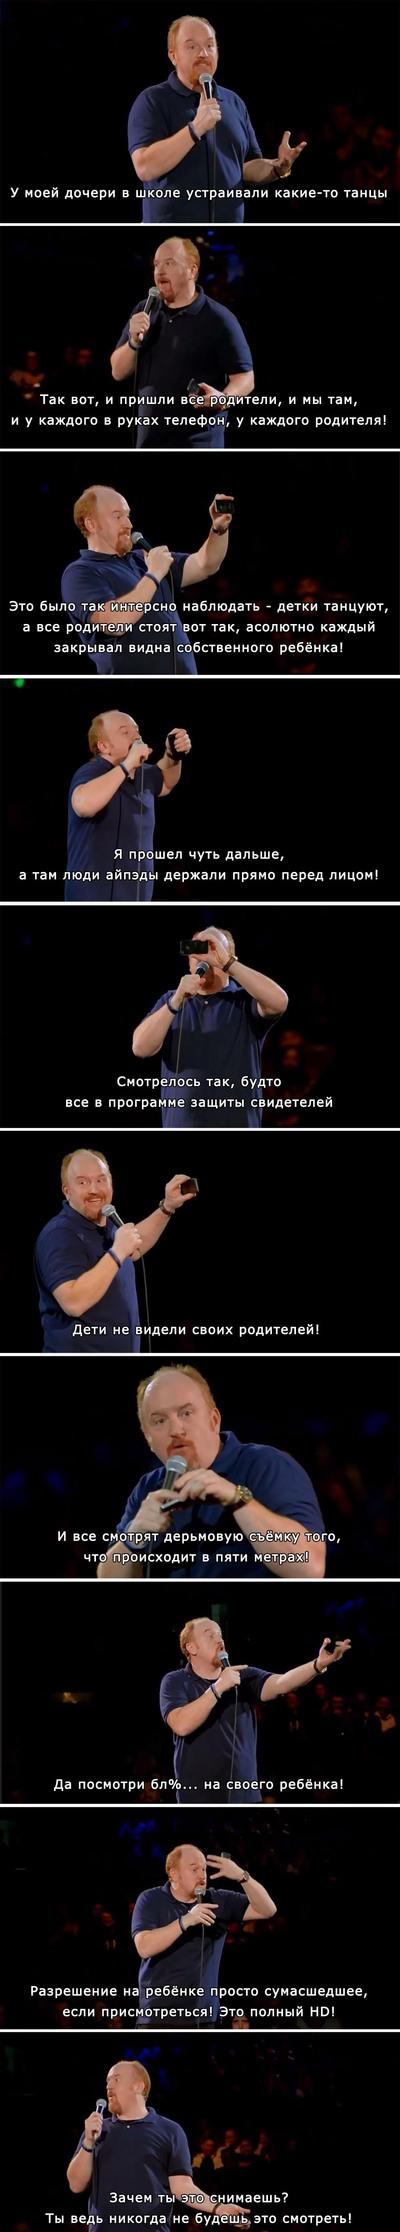 snimayu-na-mobilu-zhenu-zrelie-zhenshini-russkie-porno-kopilka